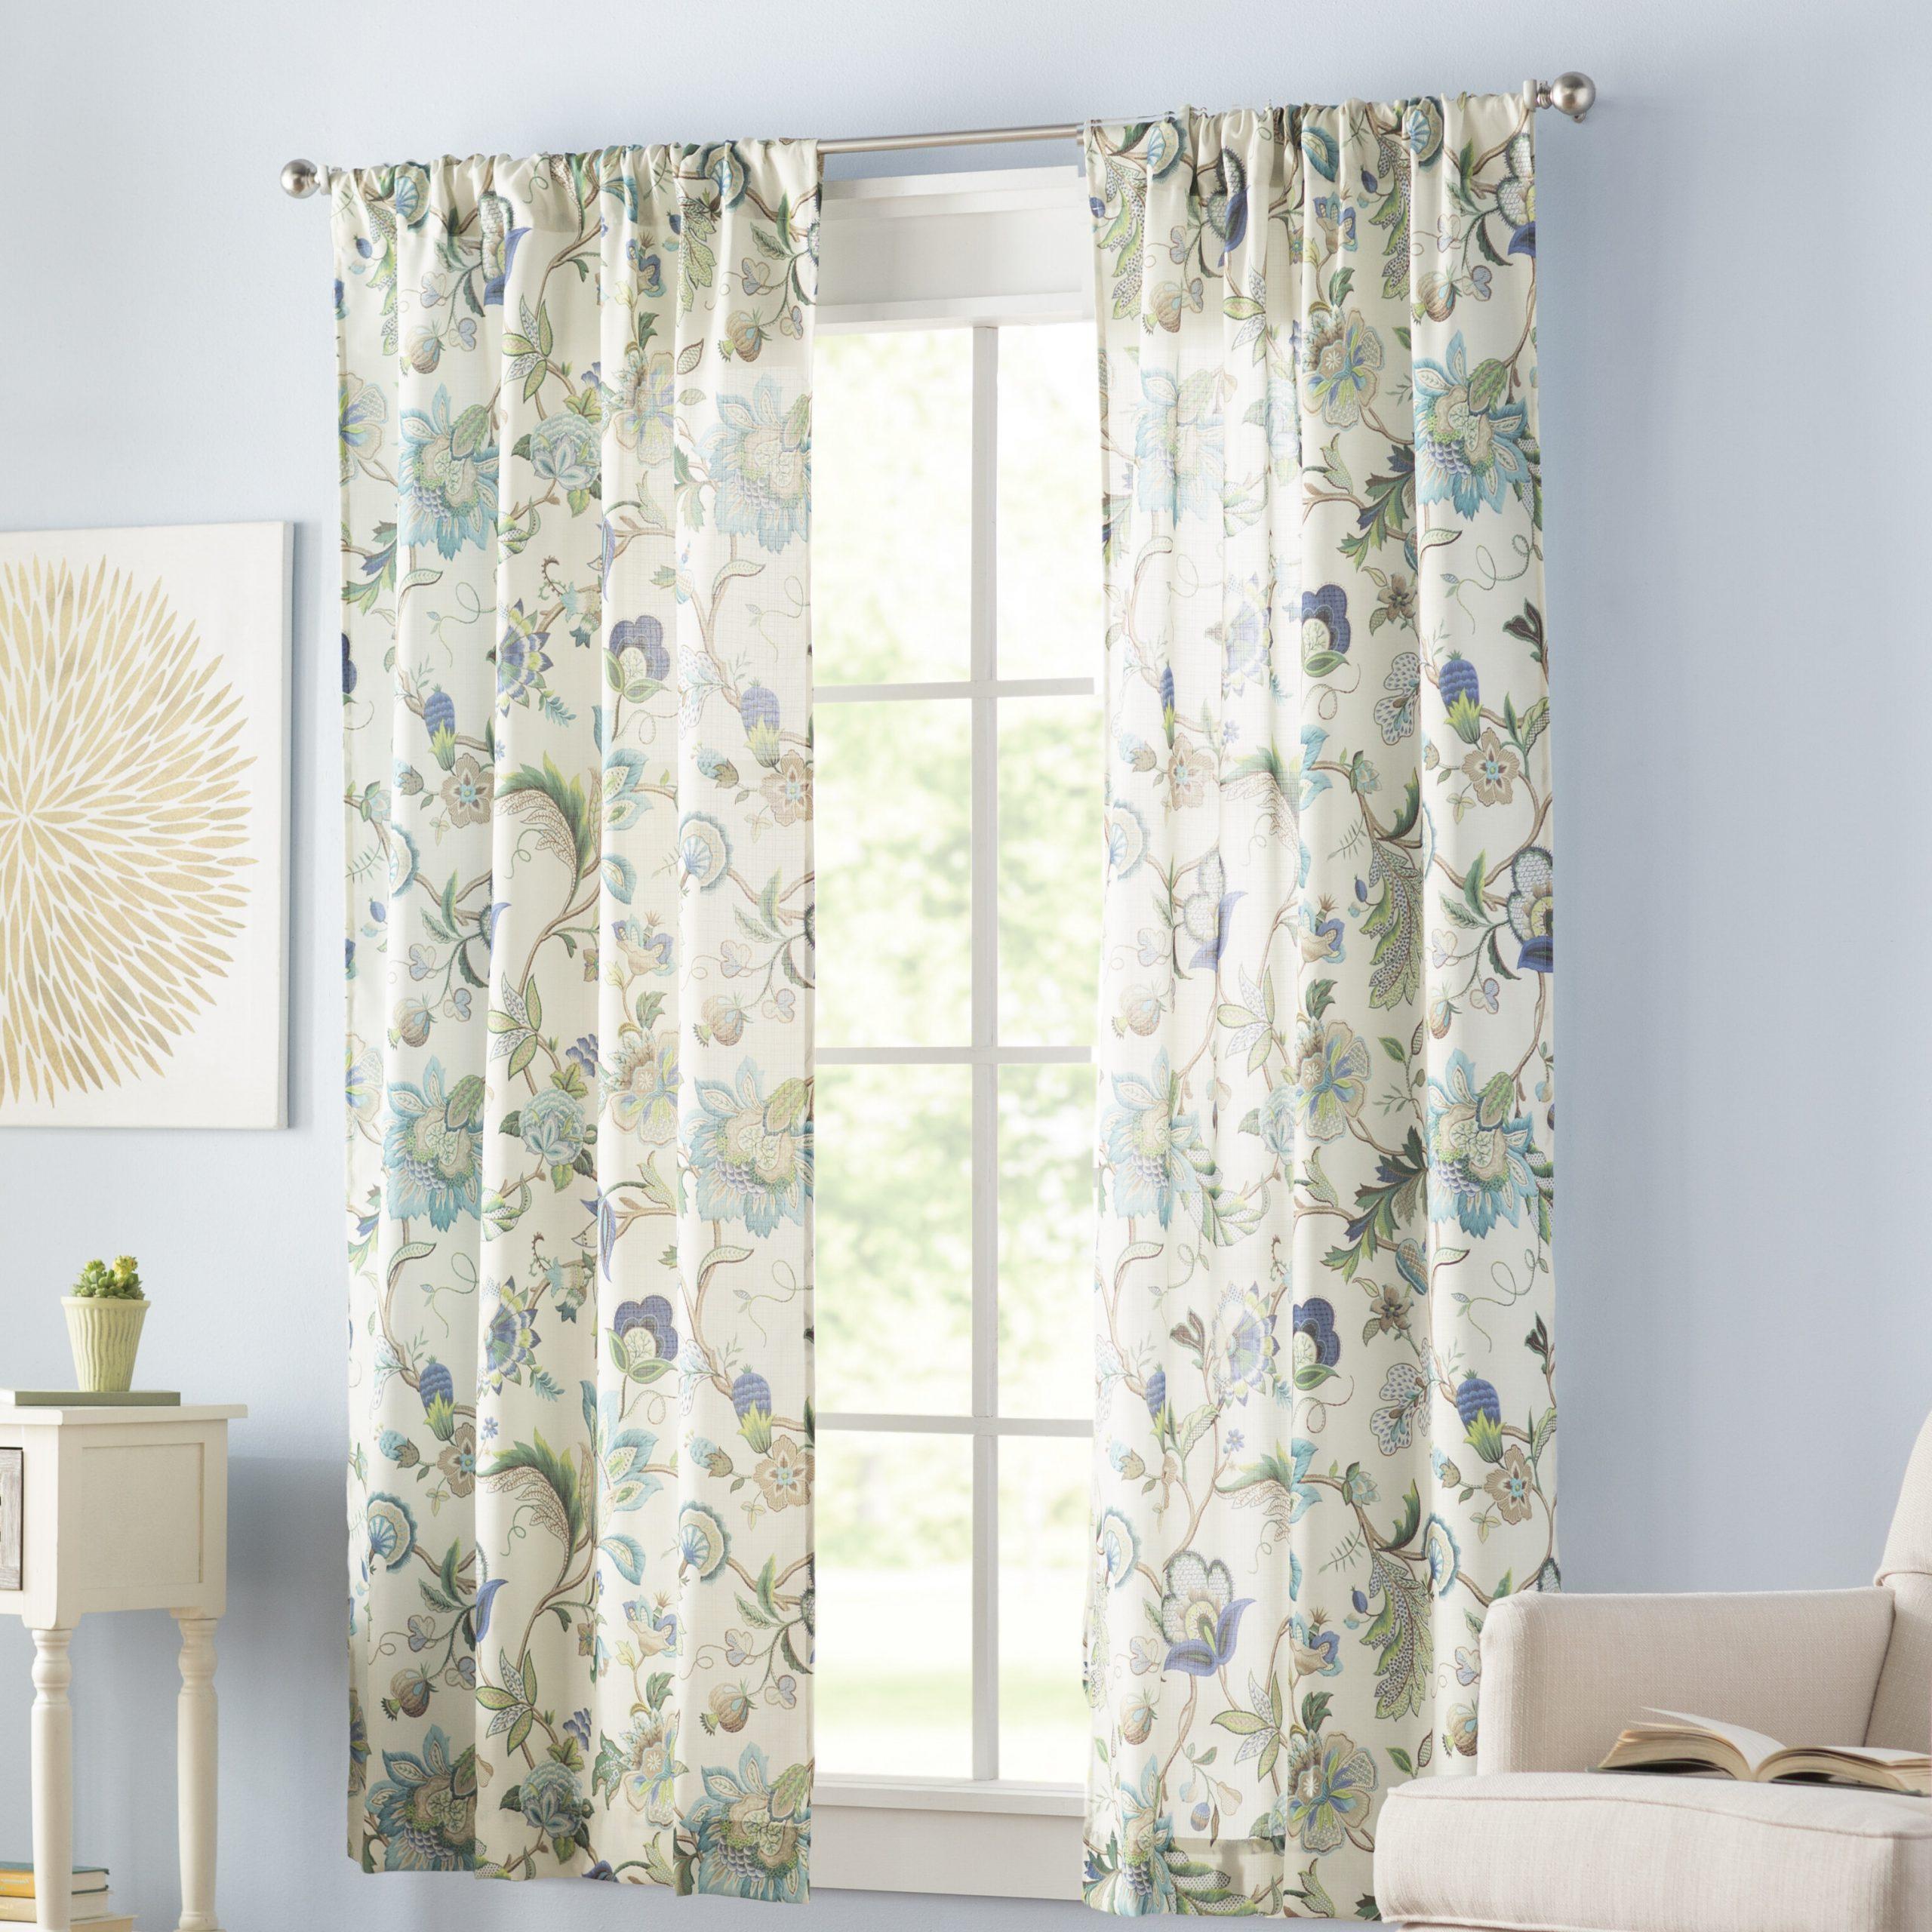 Tuckerman Floral/flower Rod Pocket Panel Pair Pertaining To Favorite Whitman Curtain Panel Pairs (View 17 of 20)